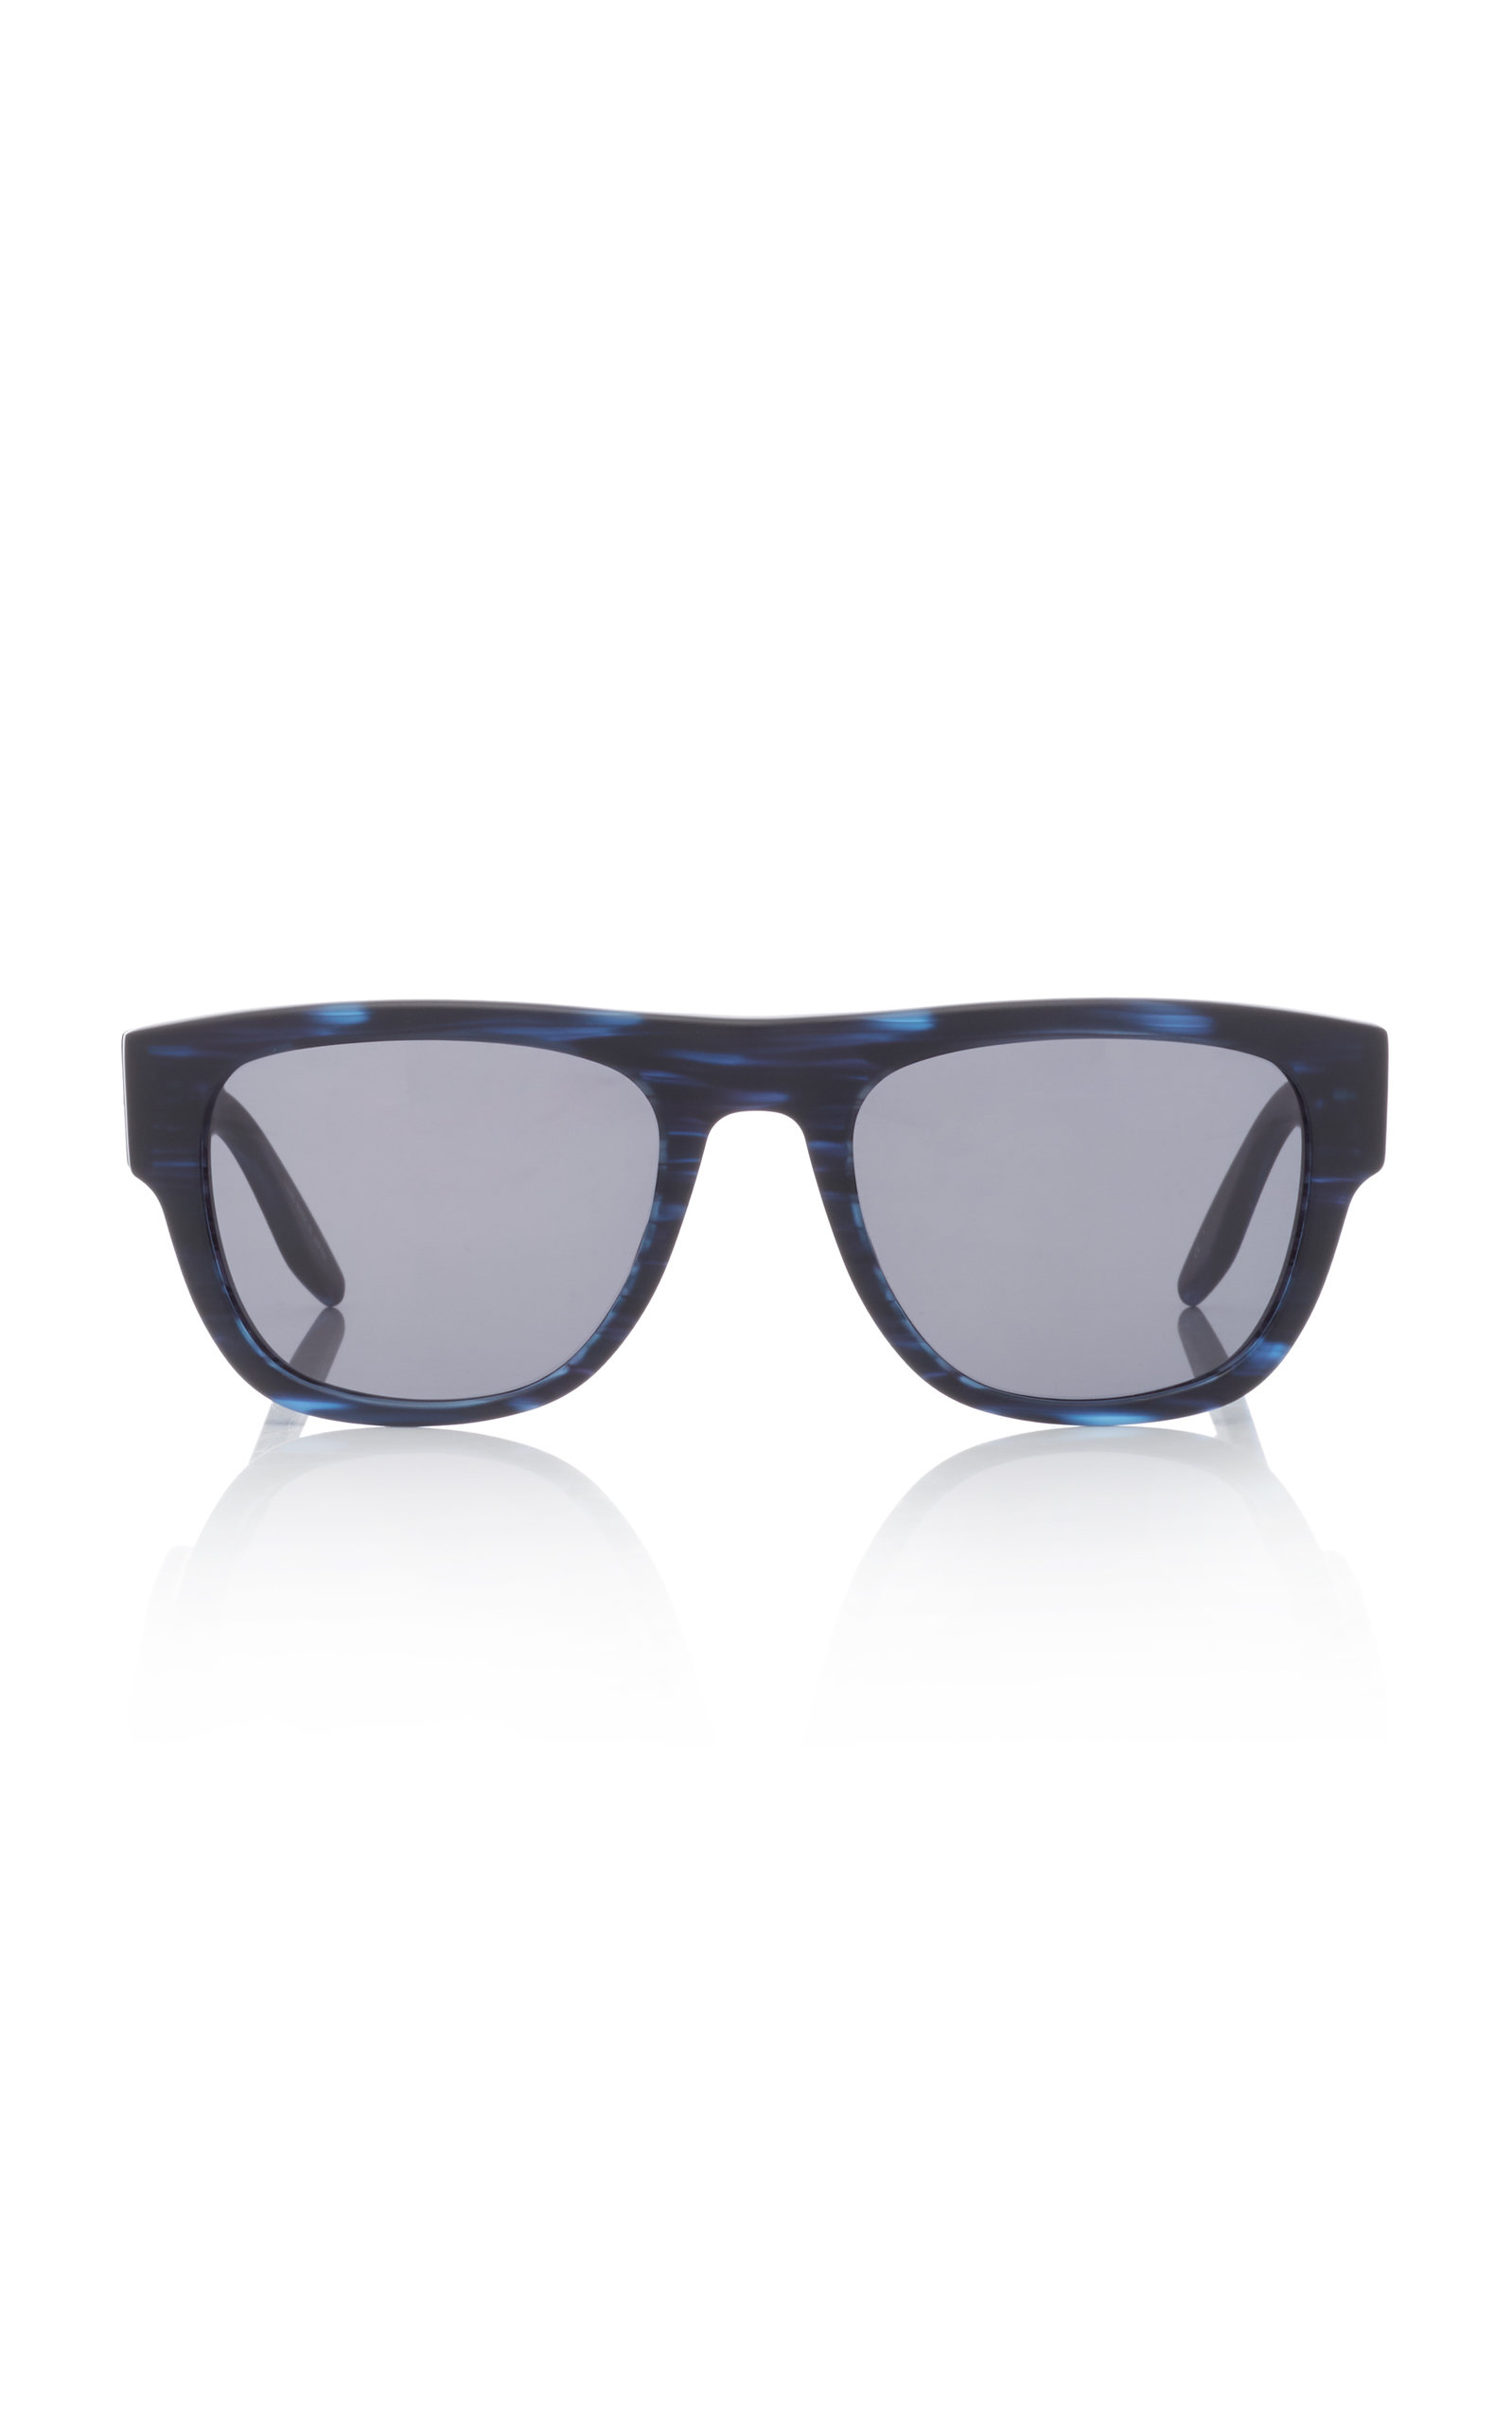 BARTON PERREIRA Kahuna 54Mm Rectangular Sunglasses in Blue